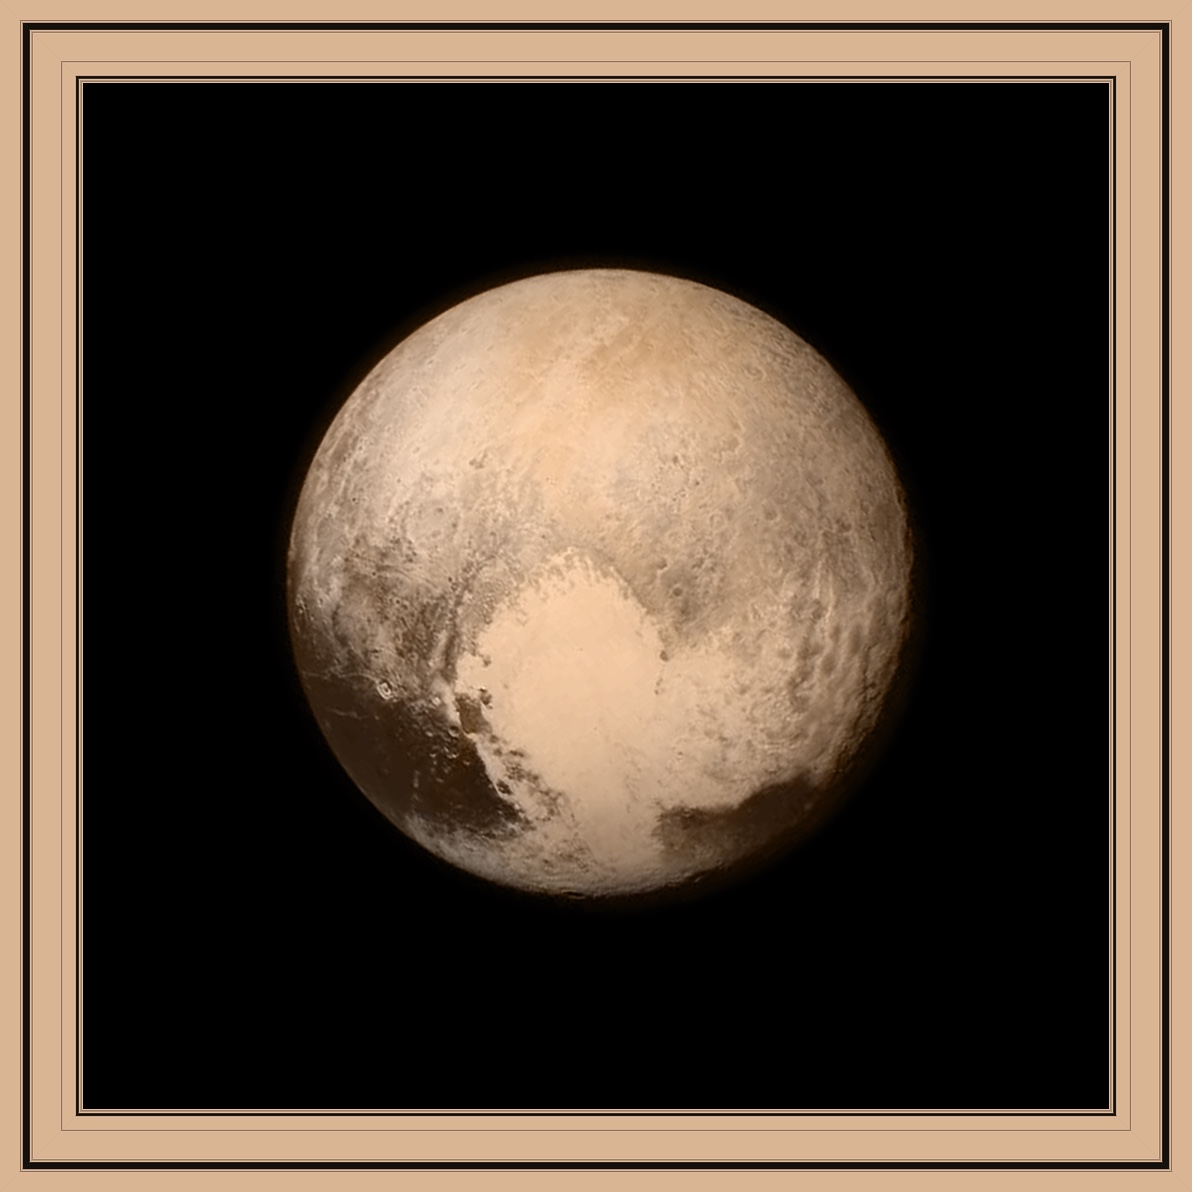 Pluto has been framed